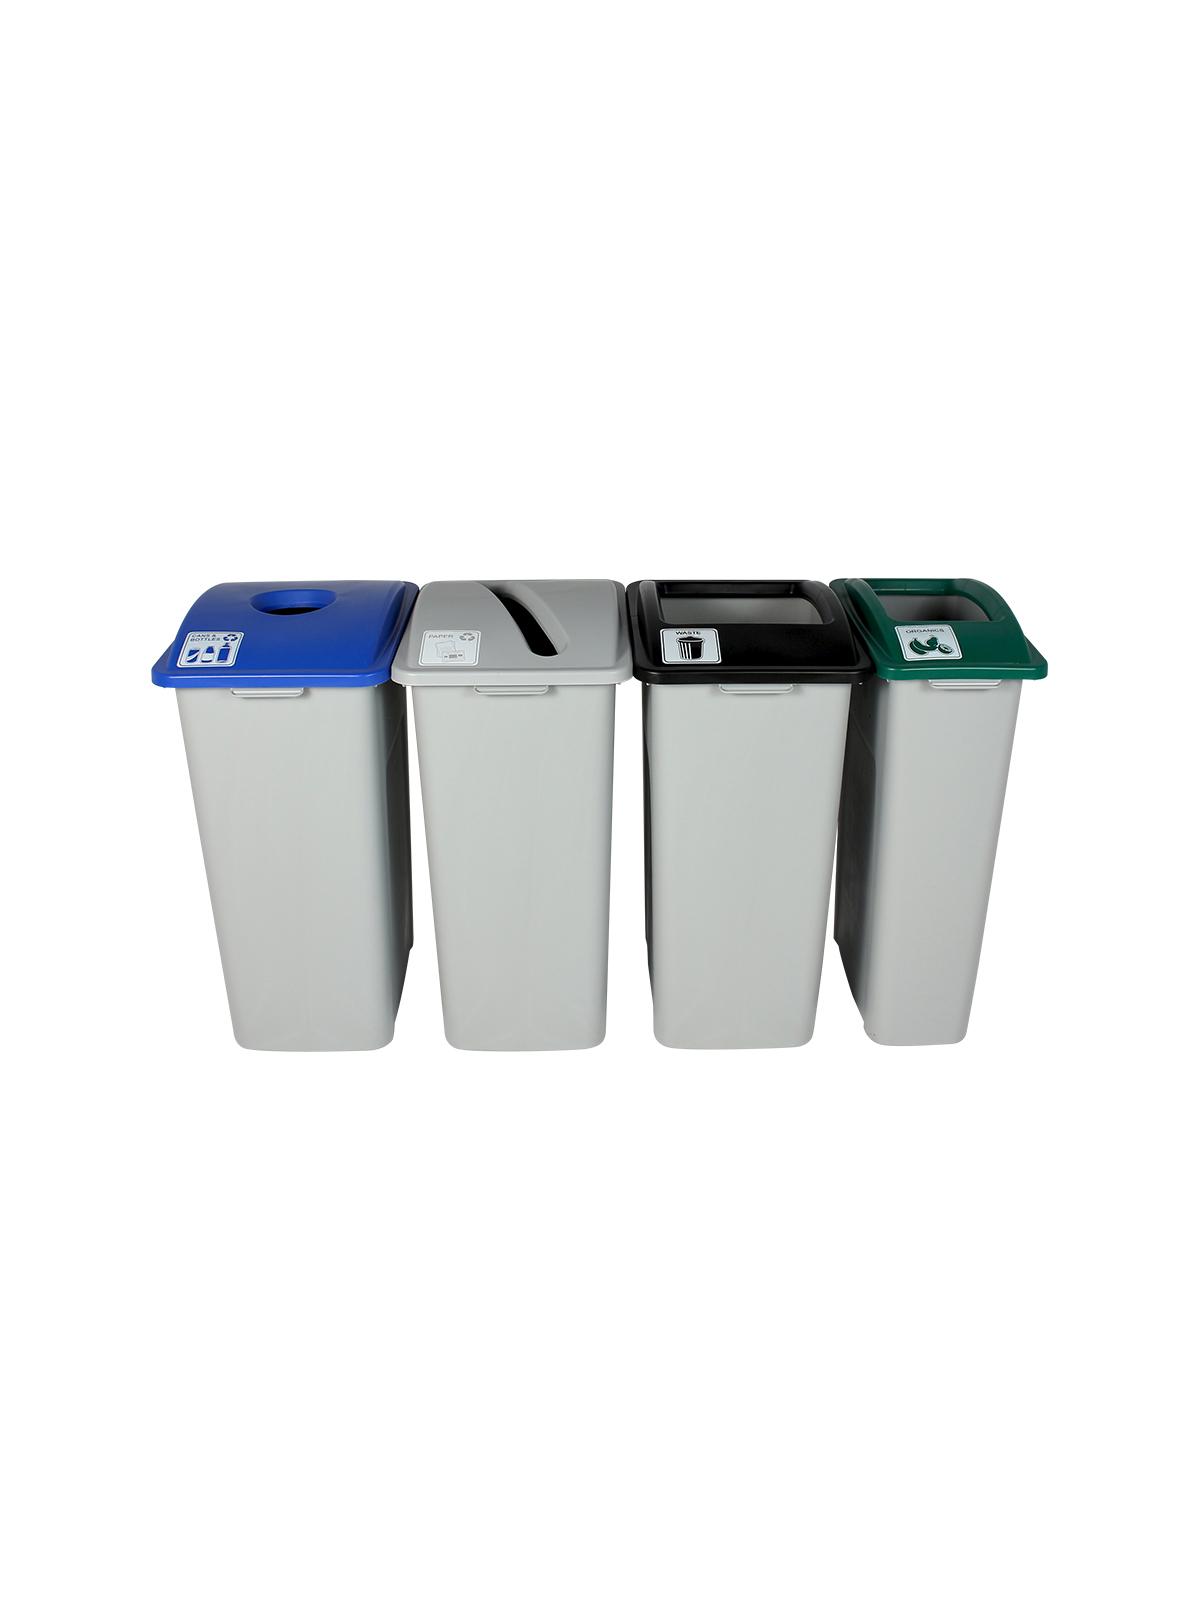 WASTE WATCHER XL - Quad - Cans & Bottles-Paper-Organics-Waste - Circle-Slot-Full - Grey-Blue-Grey-Green-Black